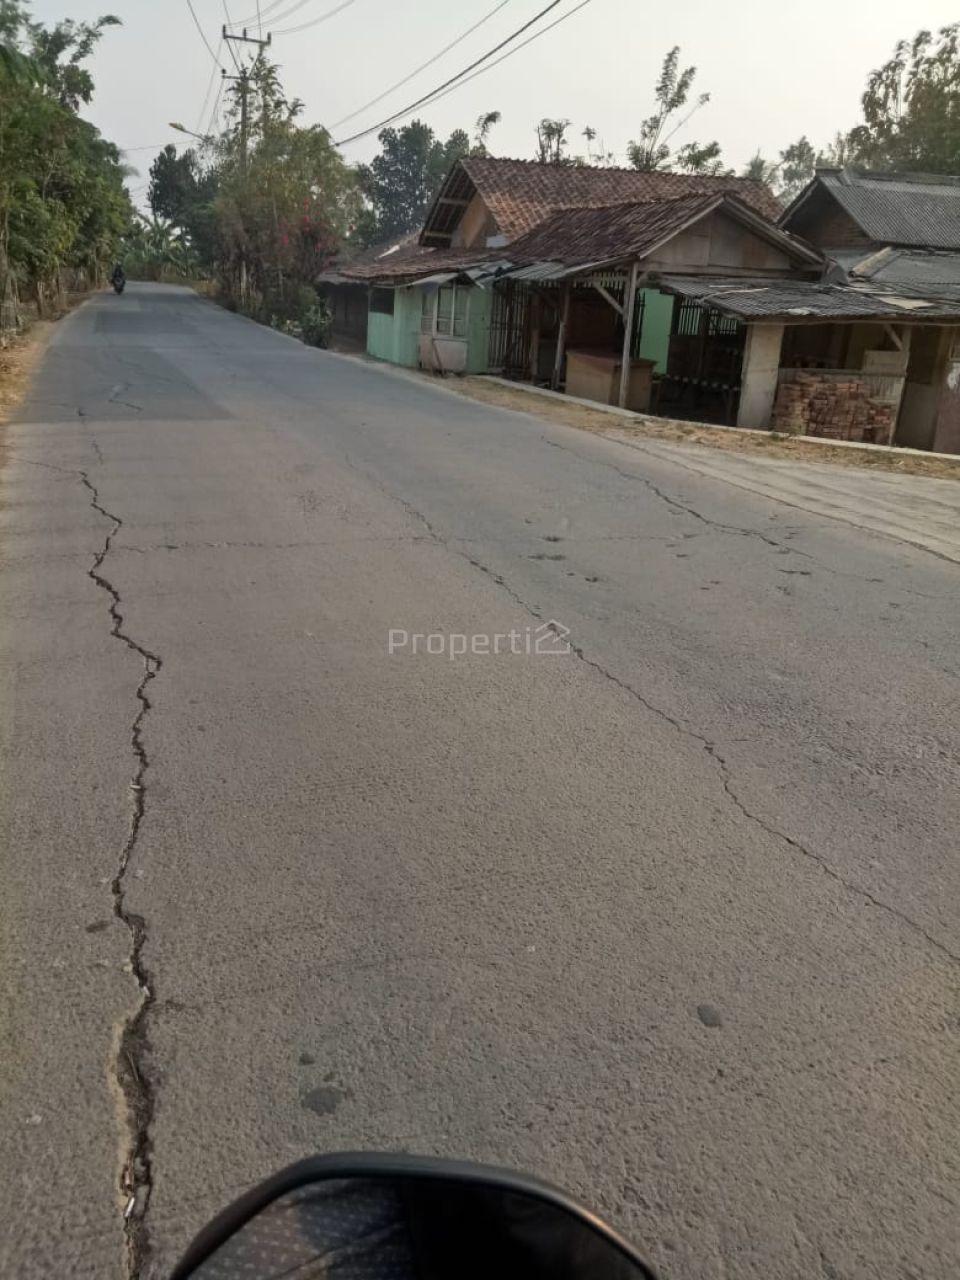 Lahan 10,8 Ha Peruntukan Gudang di Serang Baru, Bekasi, Jawa Barat